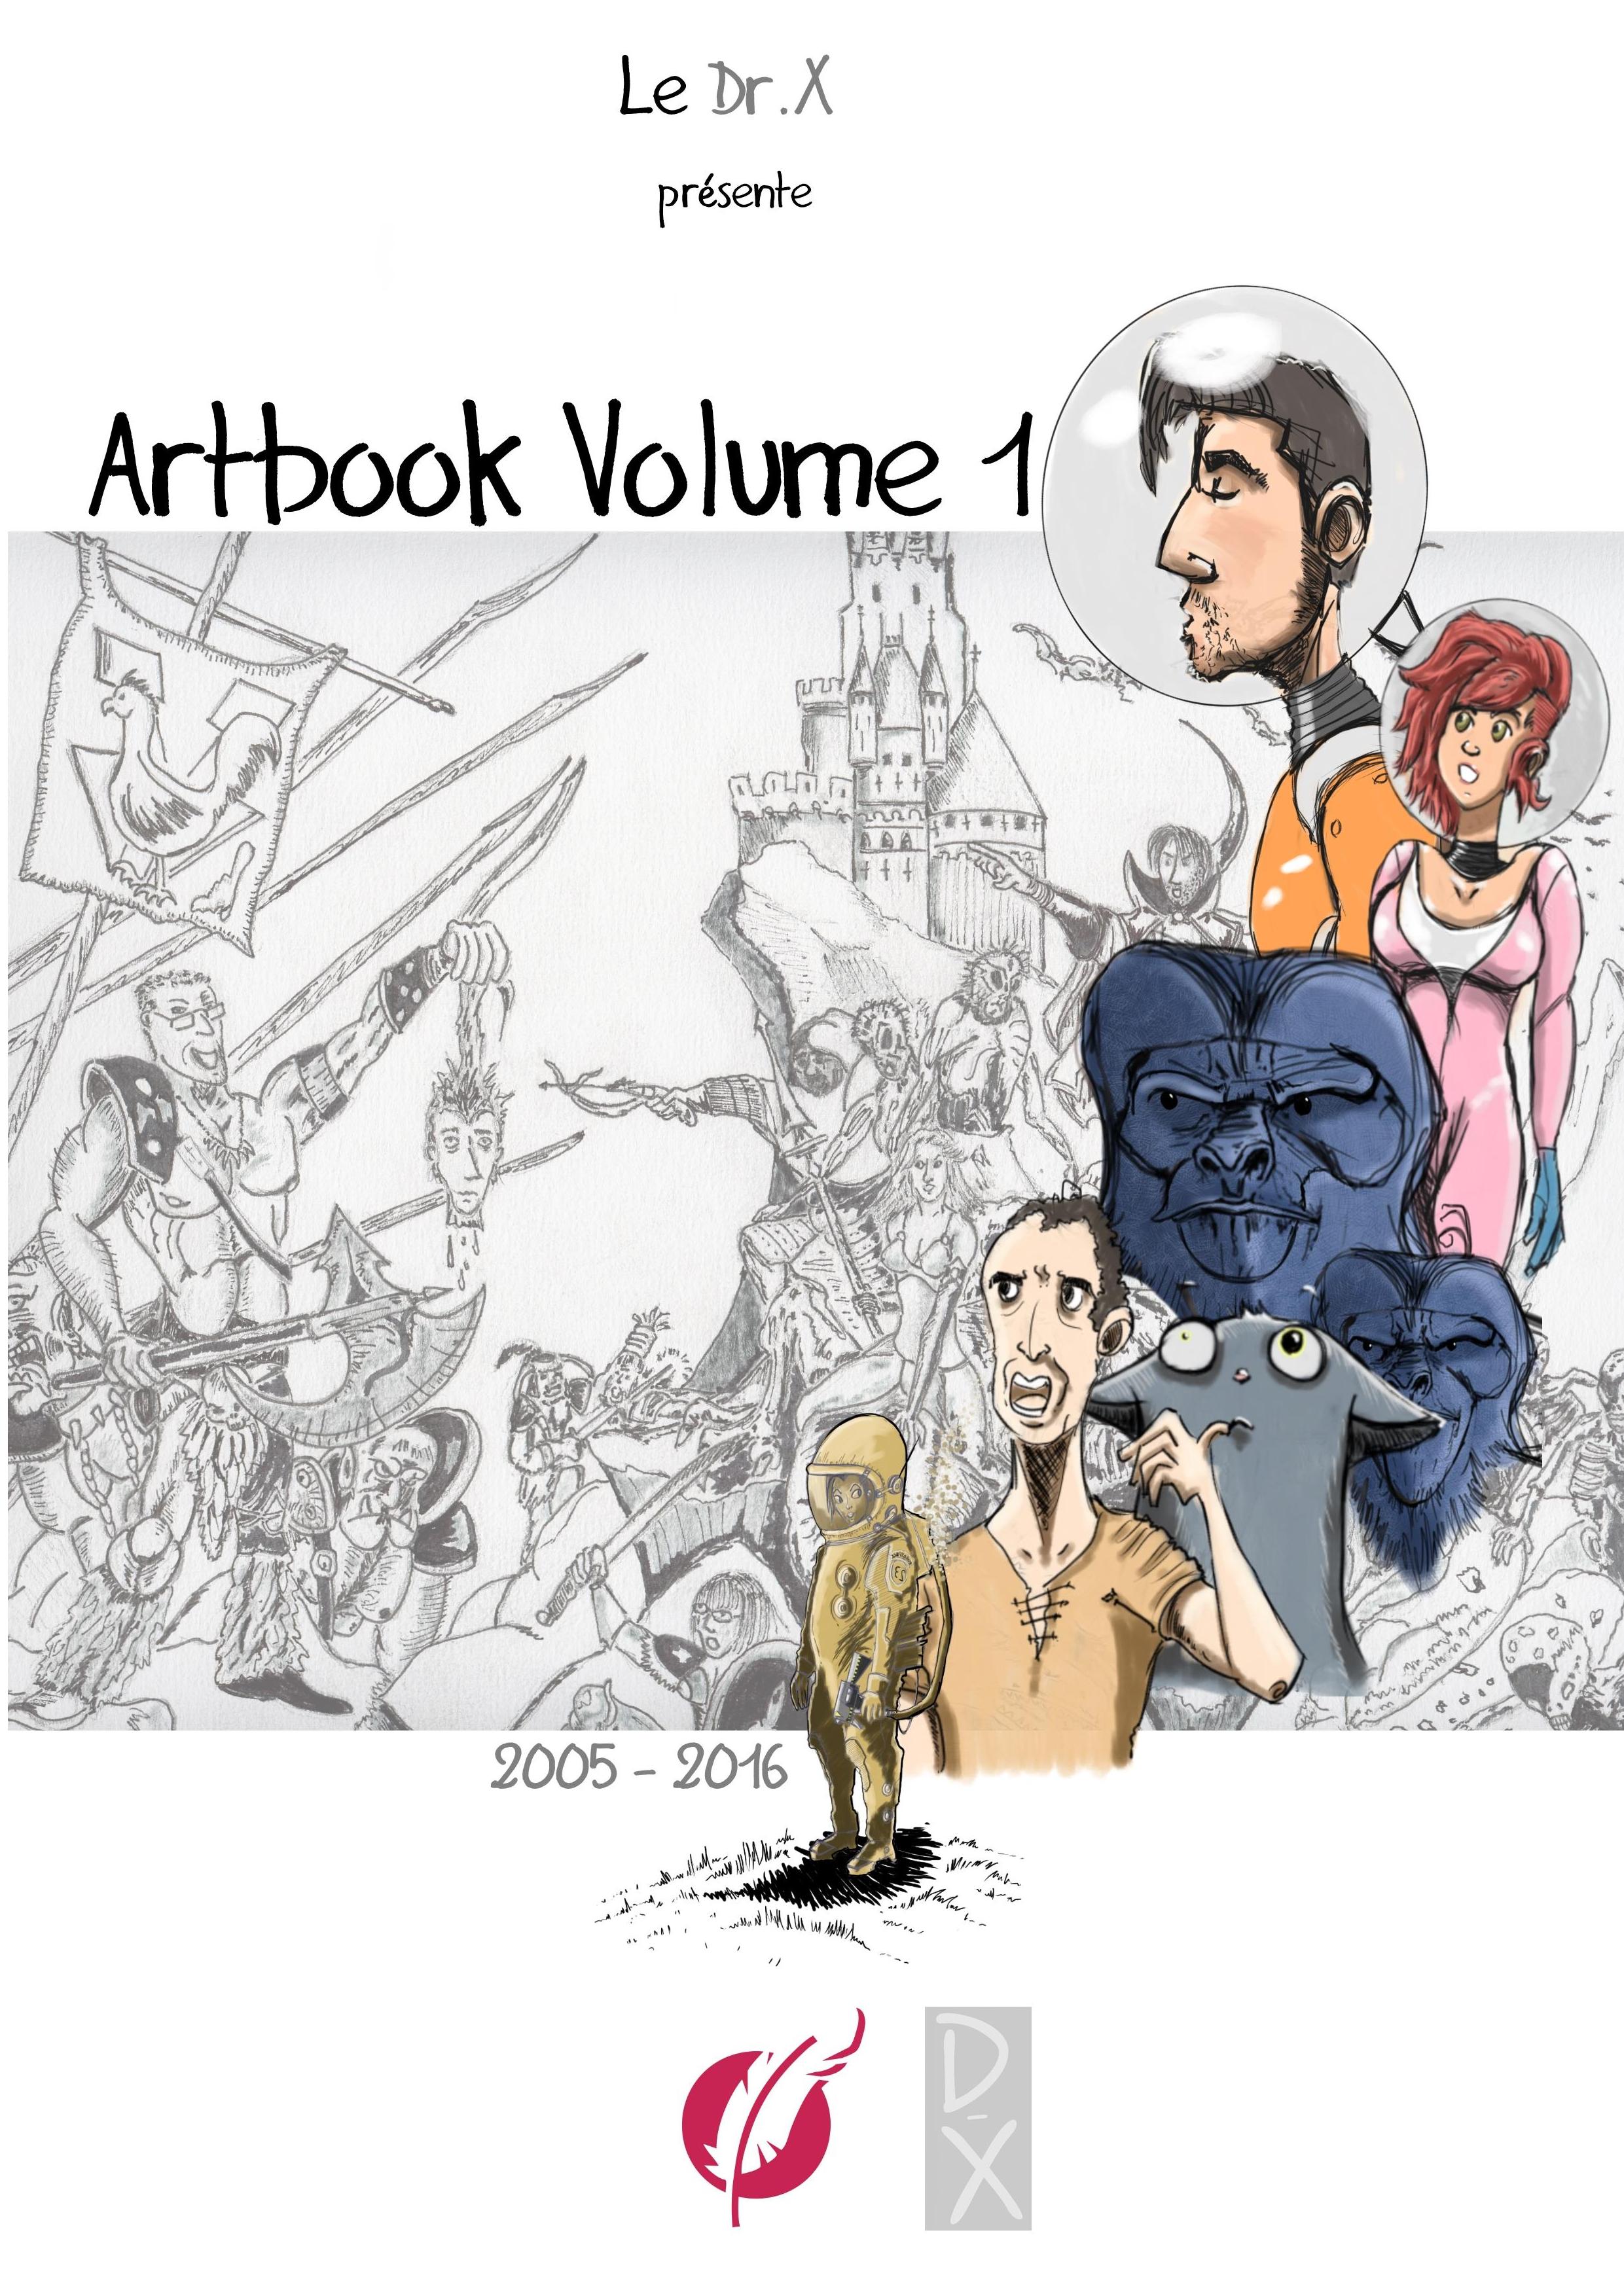 Artbook Volume 1